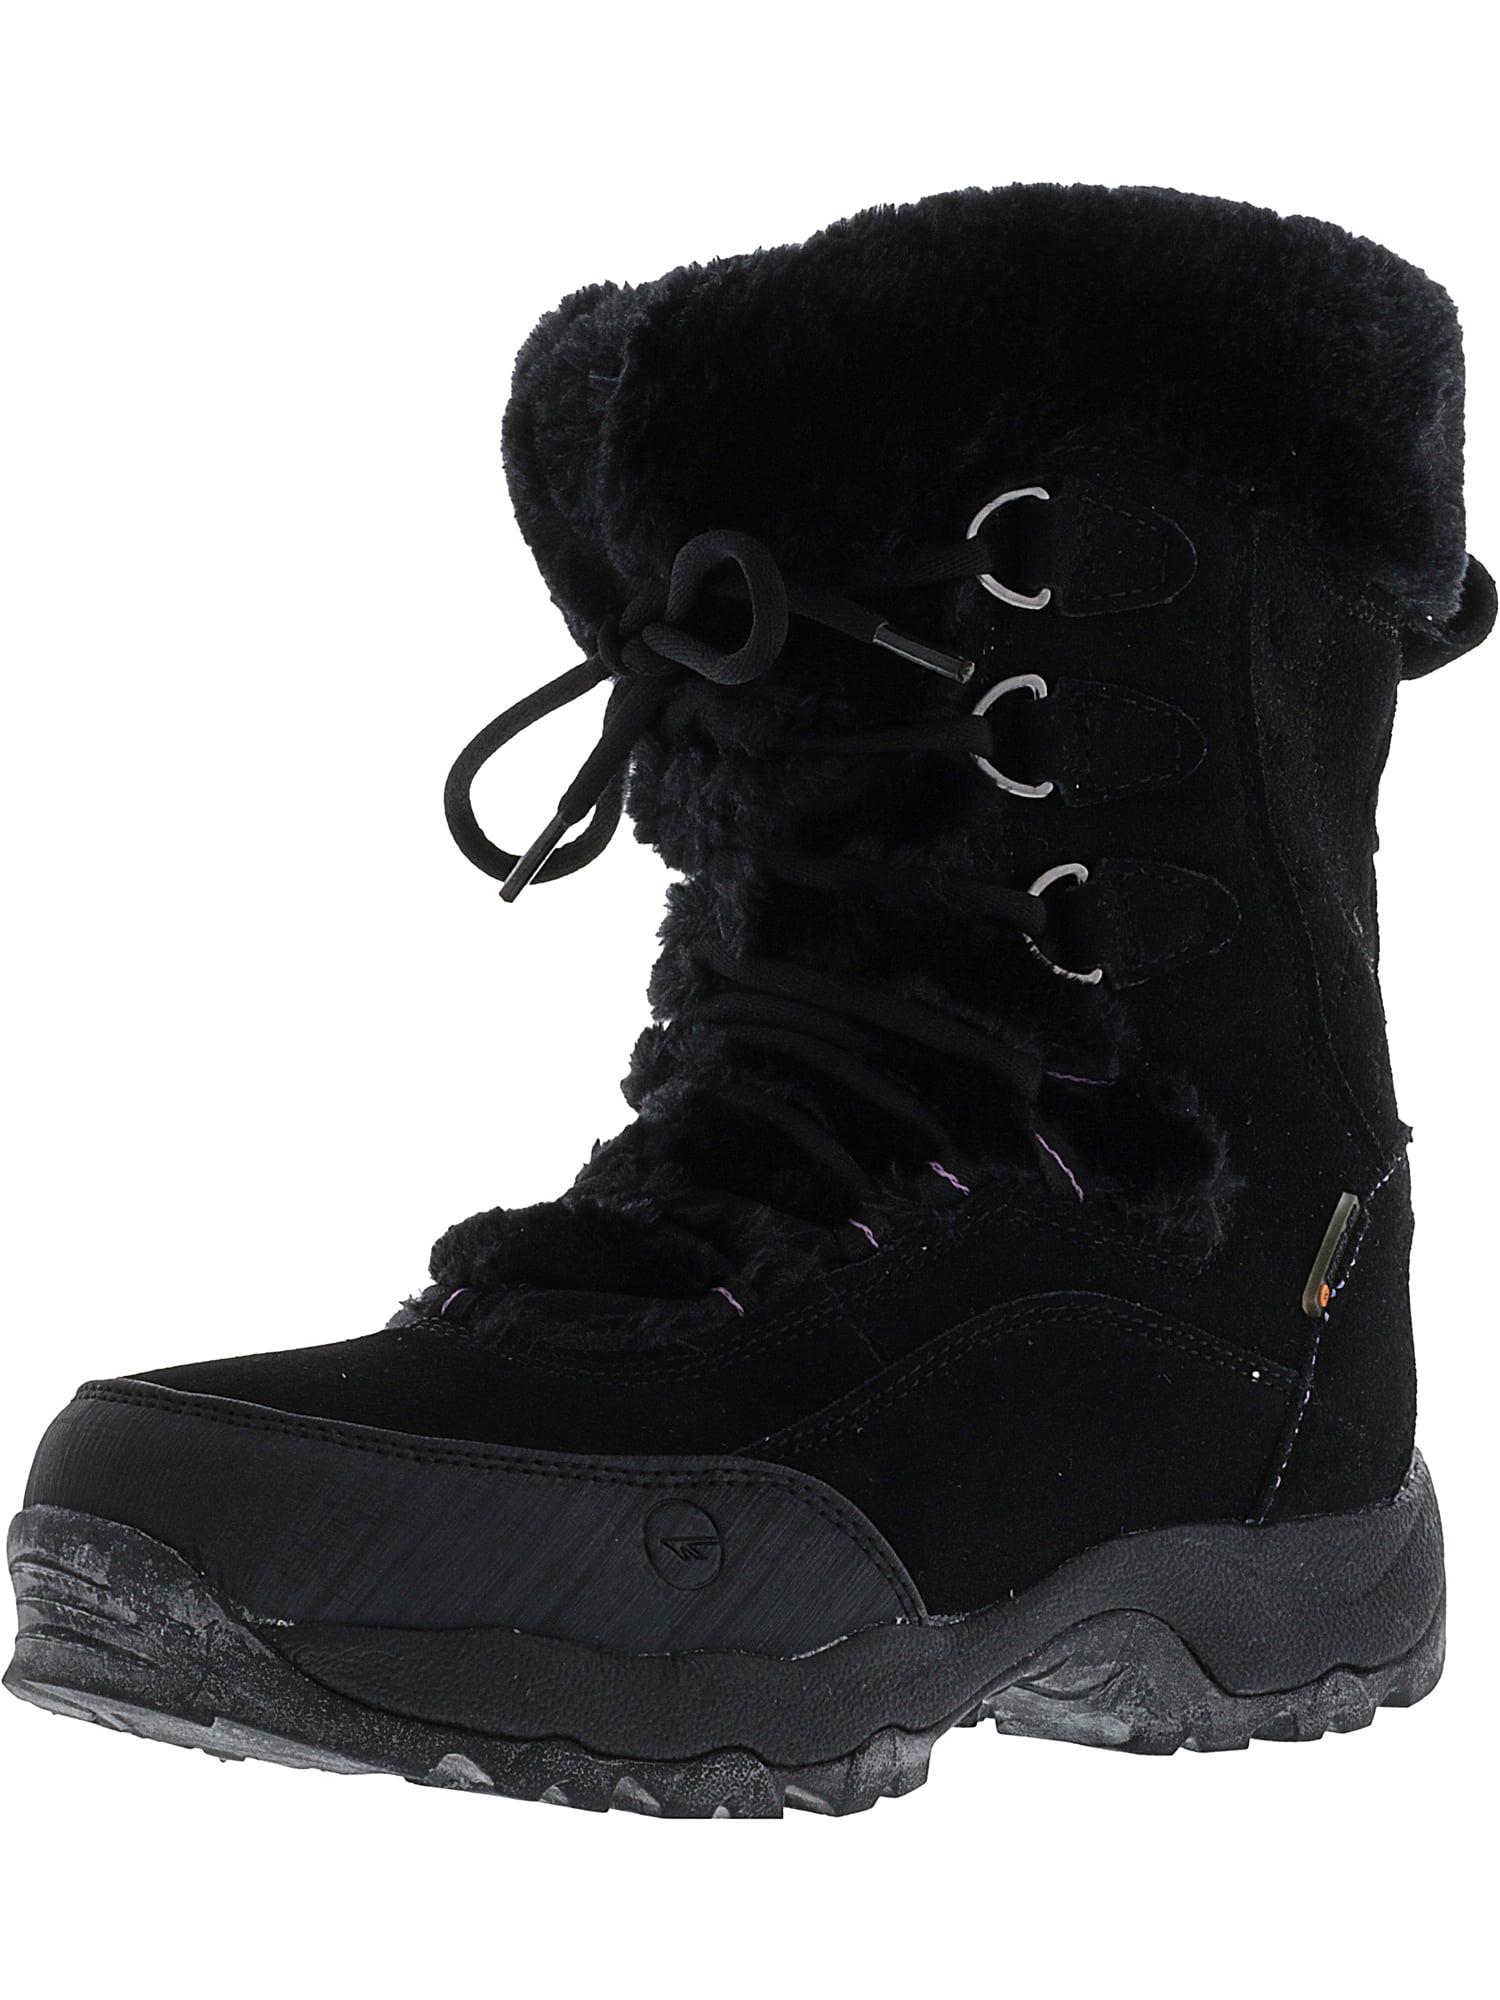 Hi-Tec Women's St.Mortitz 200 Waterproof Ii Black   Clover Mid-Calf Suede Snow Boot 8M by Hi-Tec